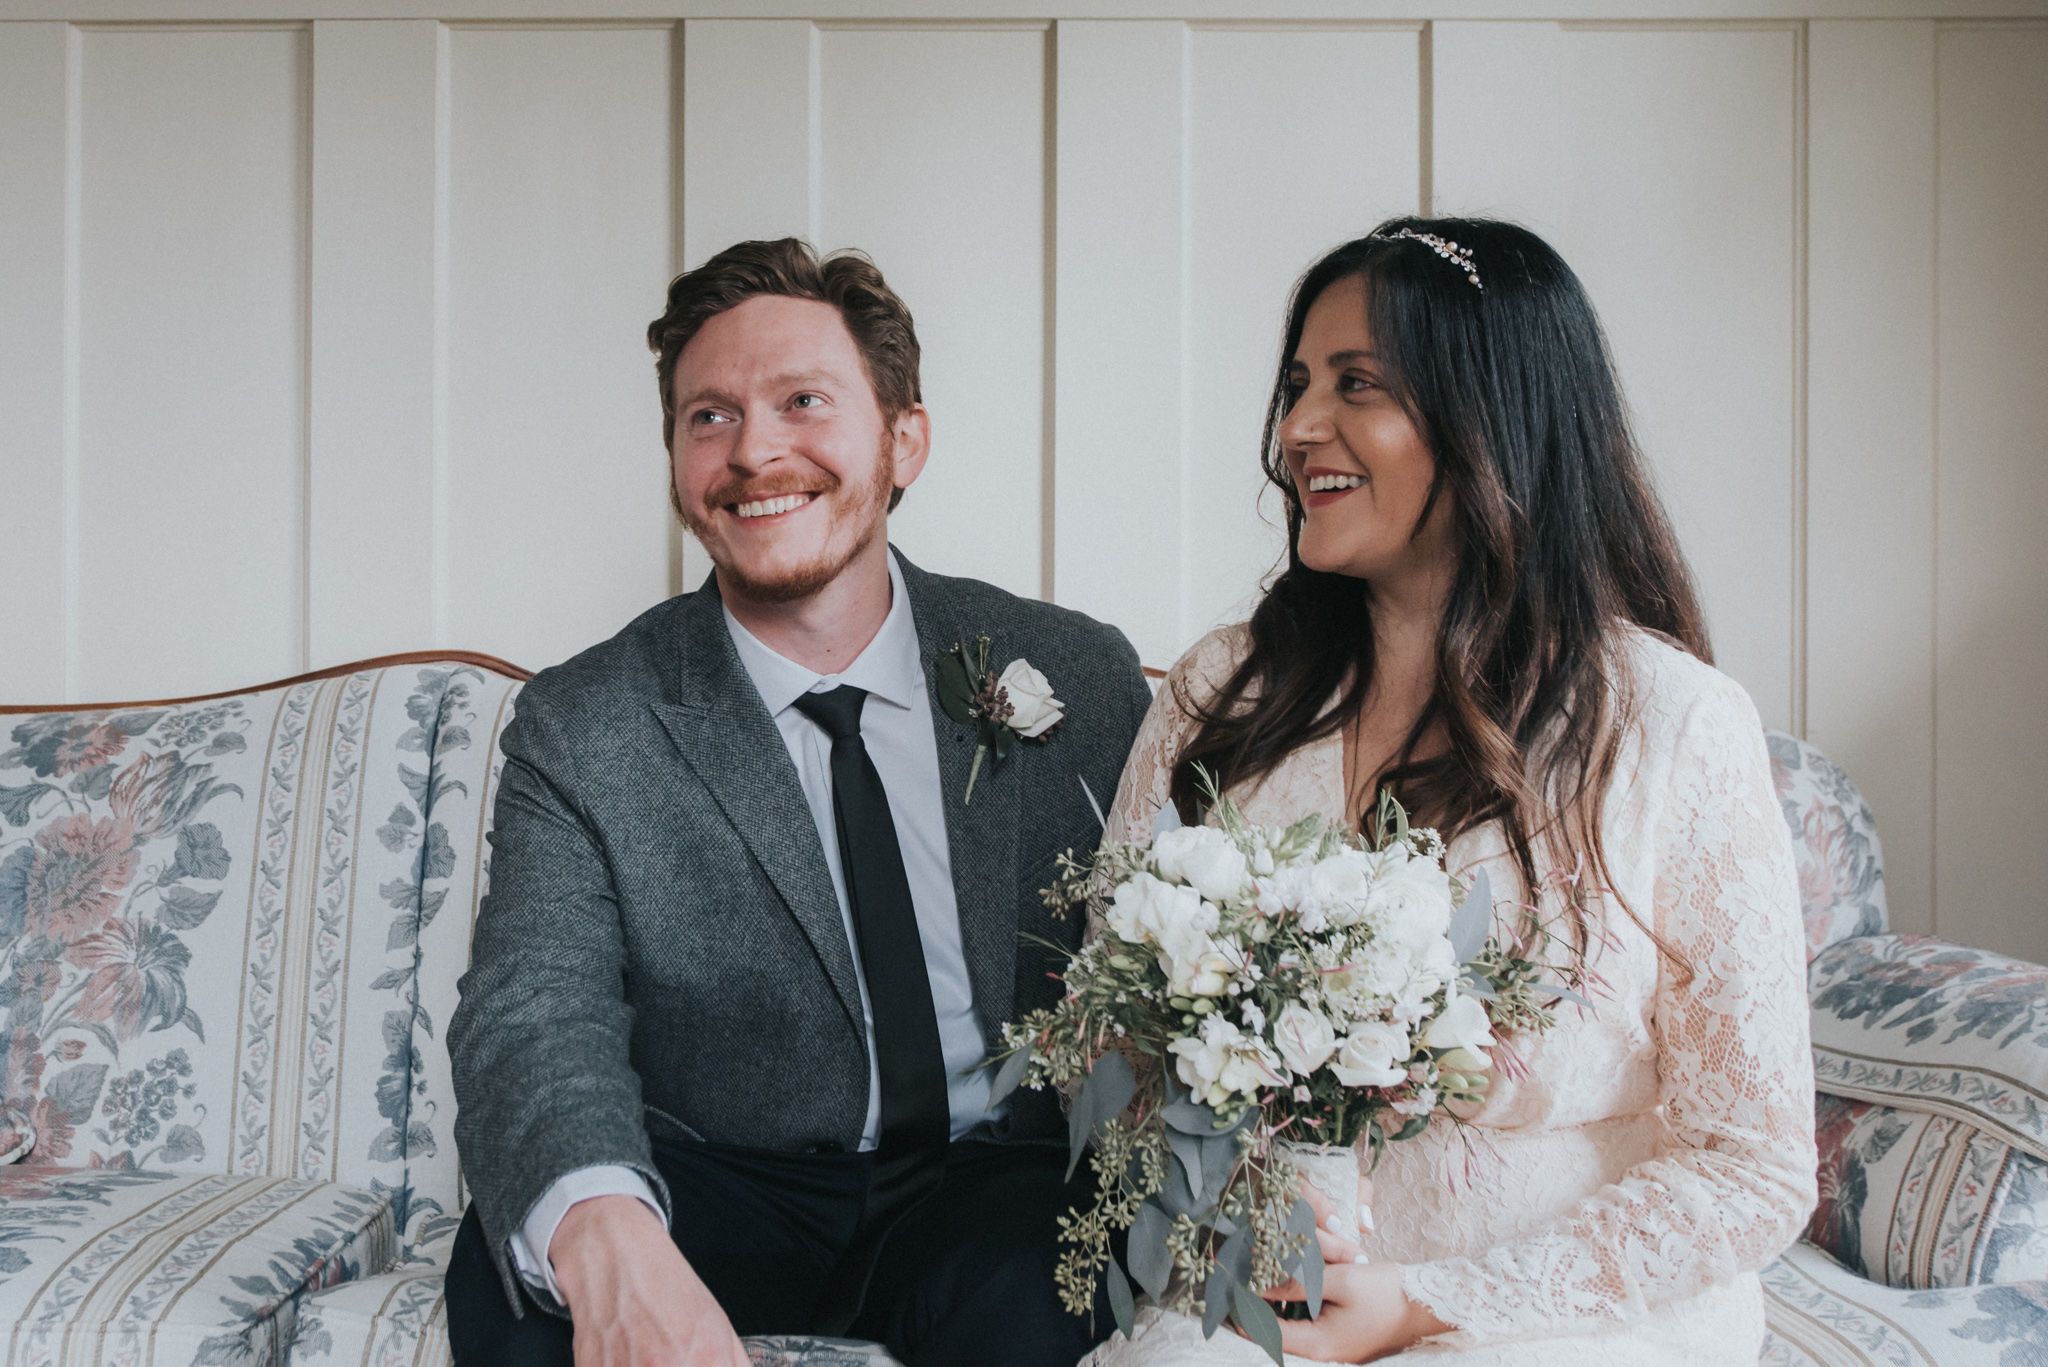 Bellingham wedding Woodstock Farms Vishal Goklani Seattle Wedding Photographer023.JPG